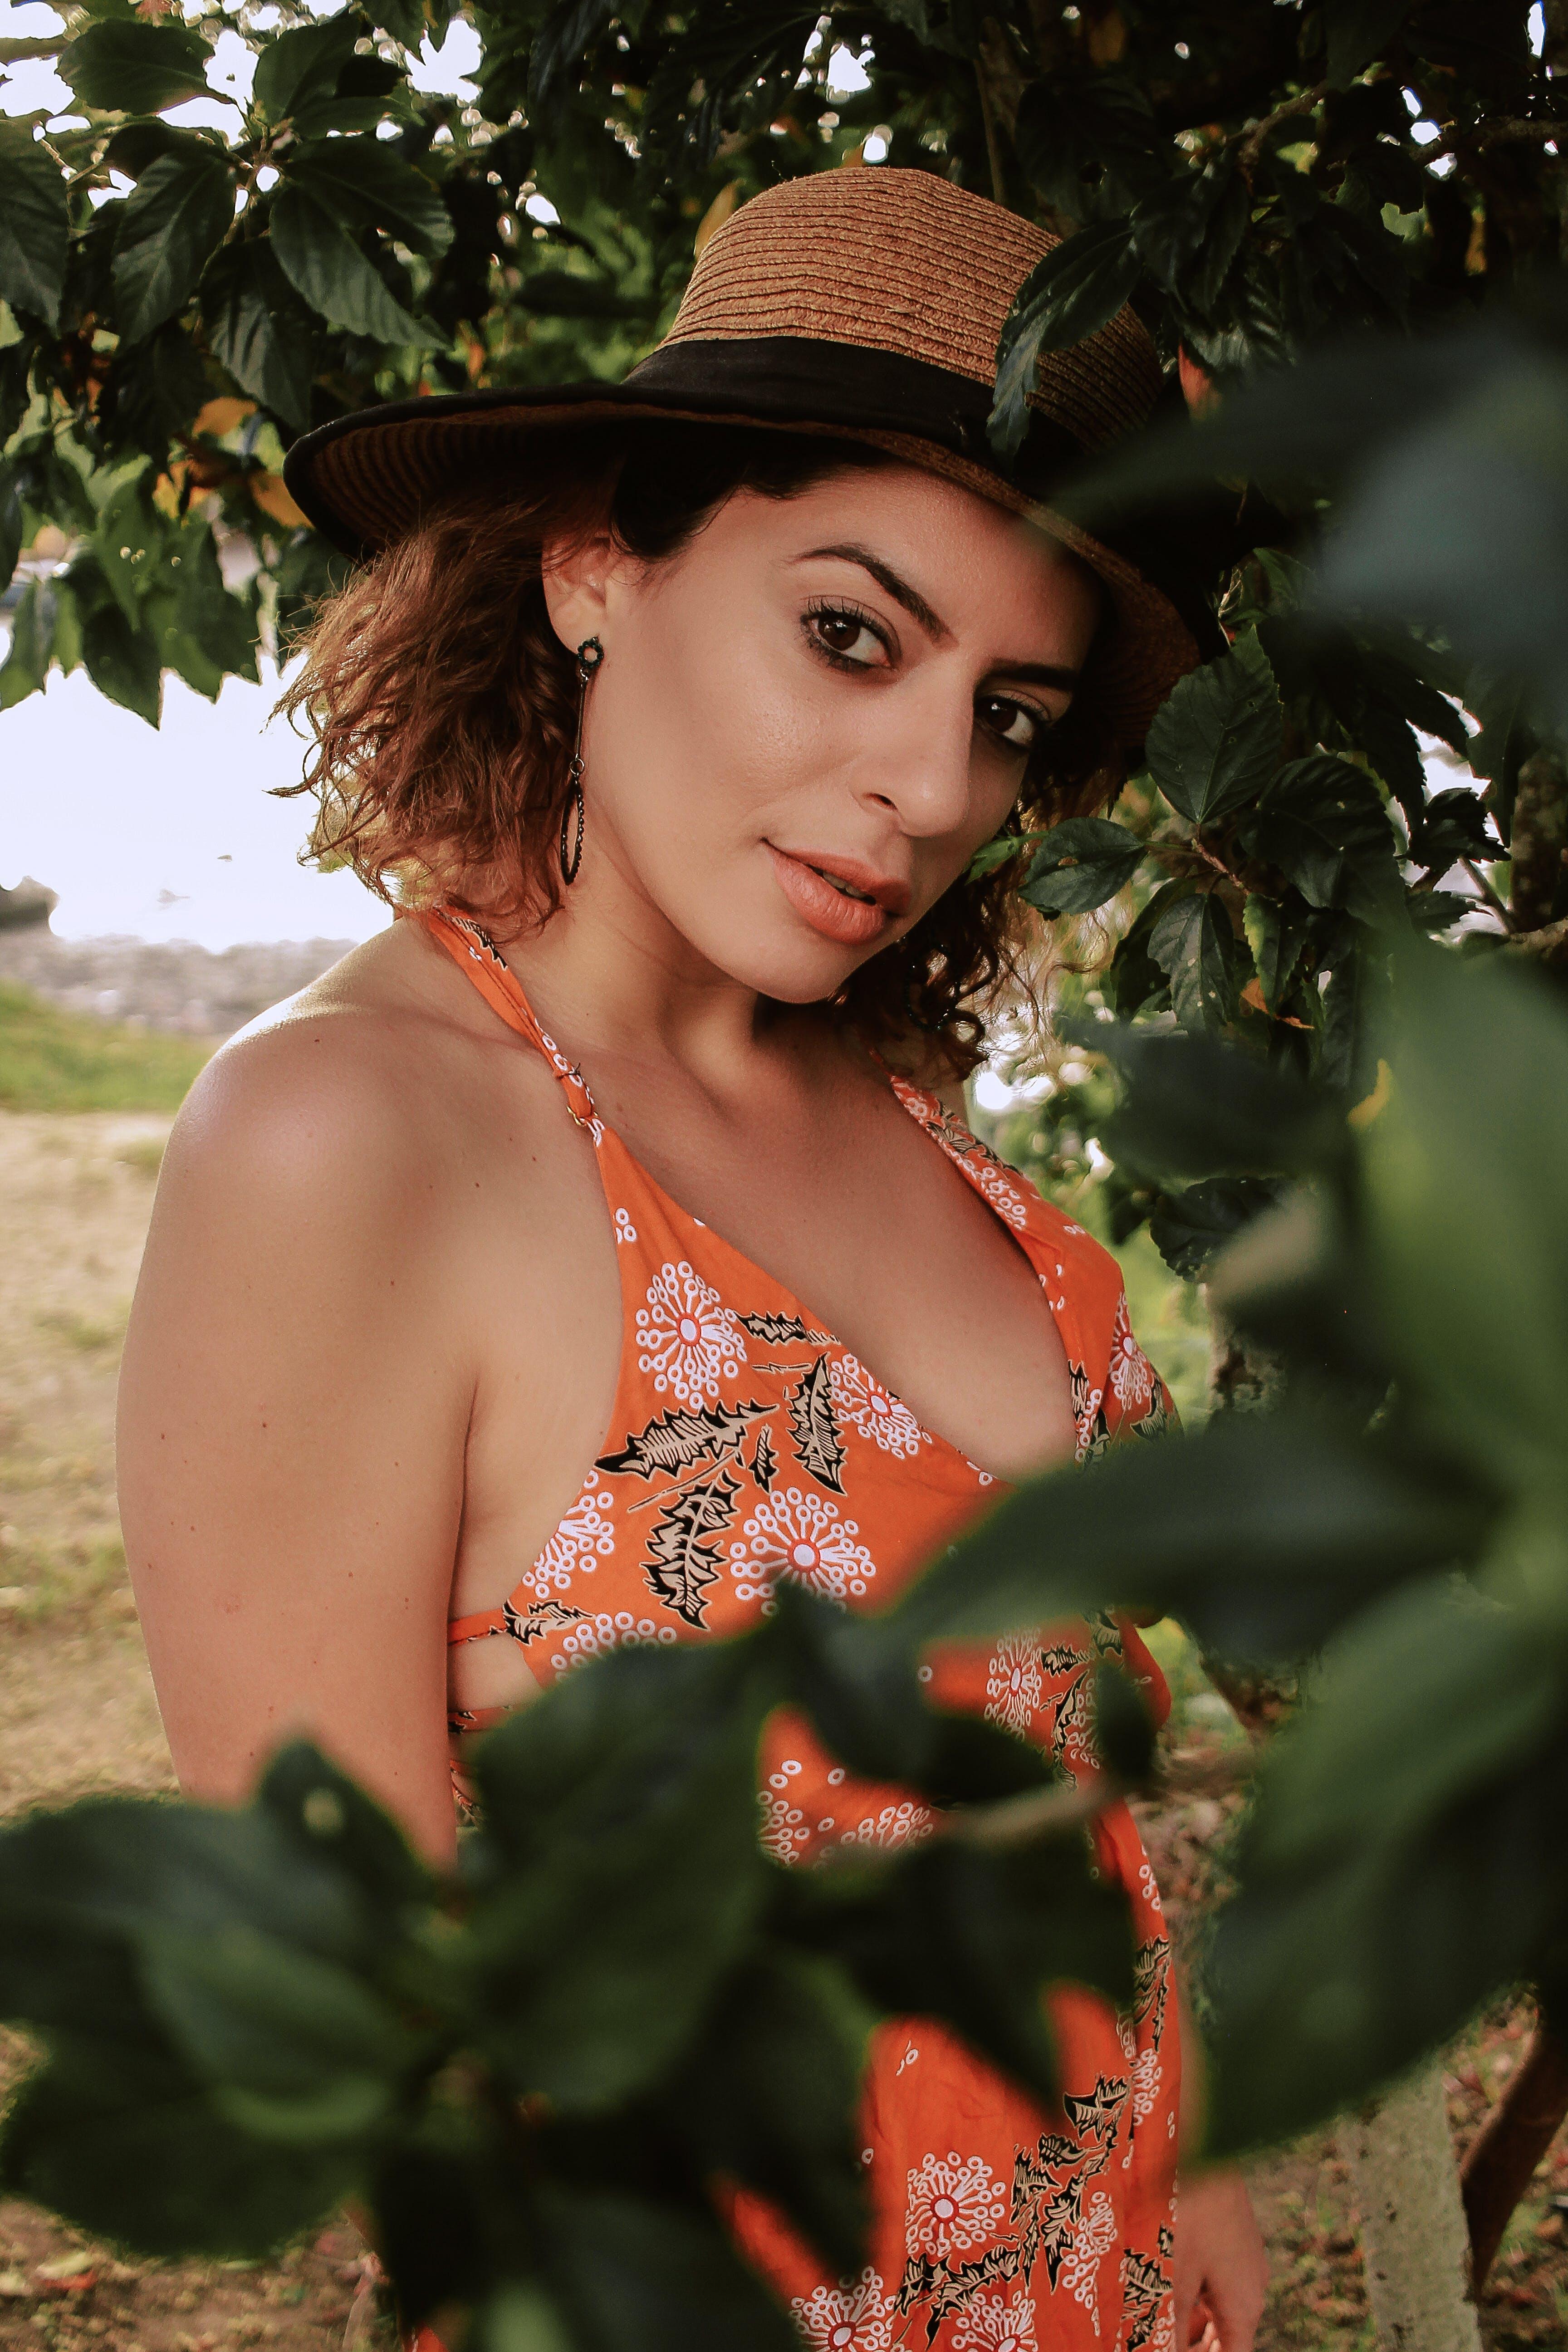 Woman Wearing Orange, Black, and White Floral Halter-neck Top